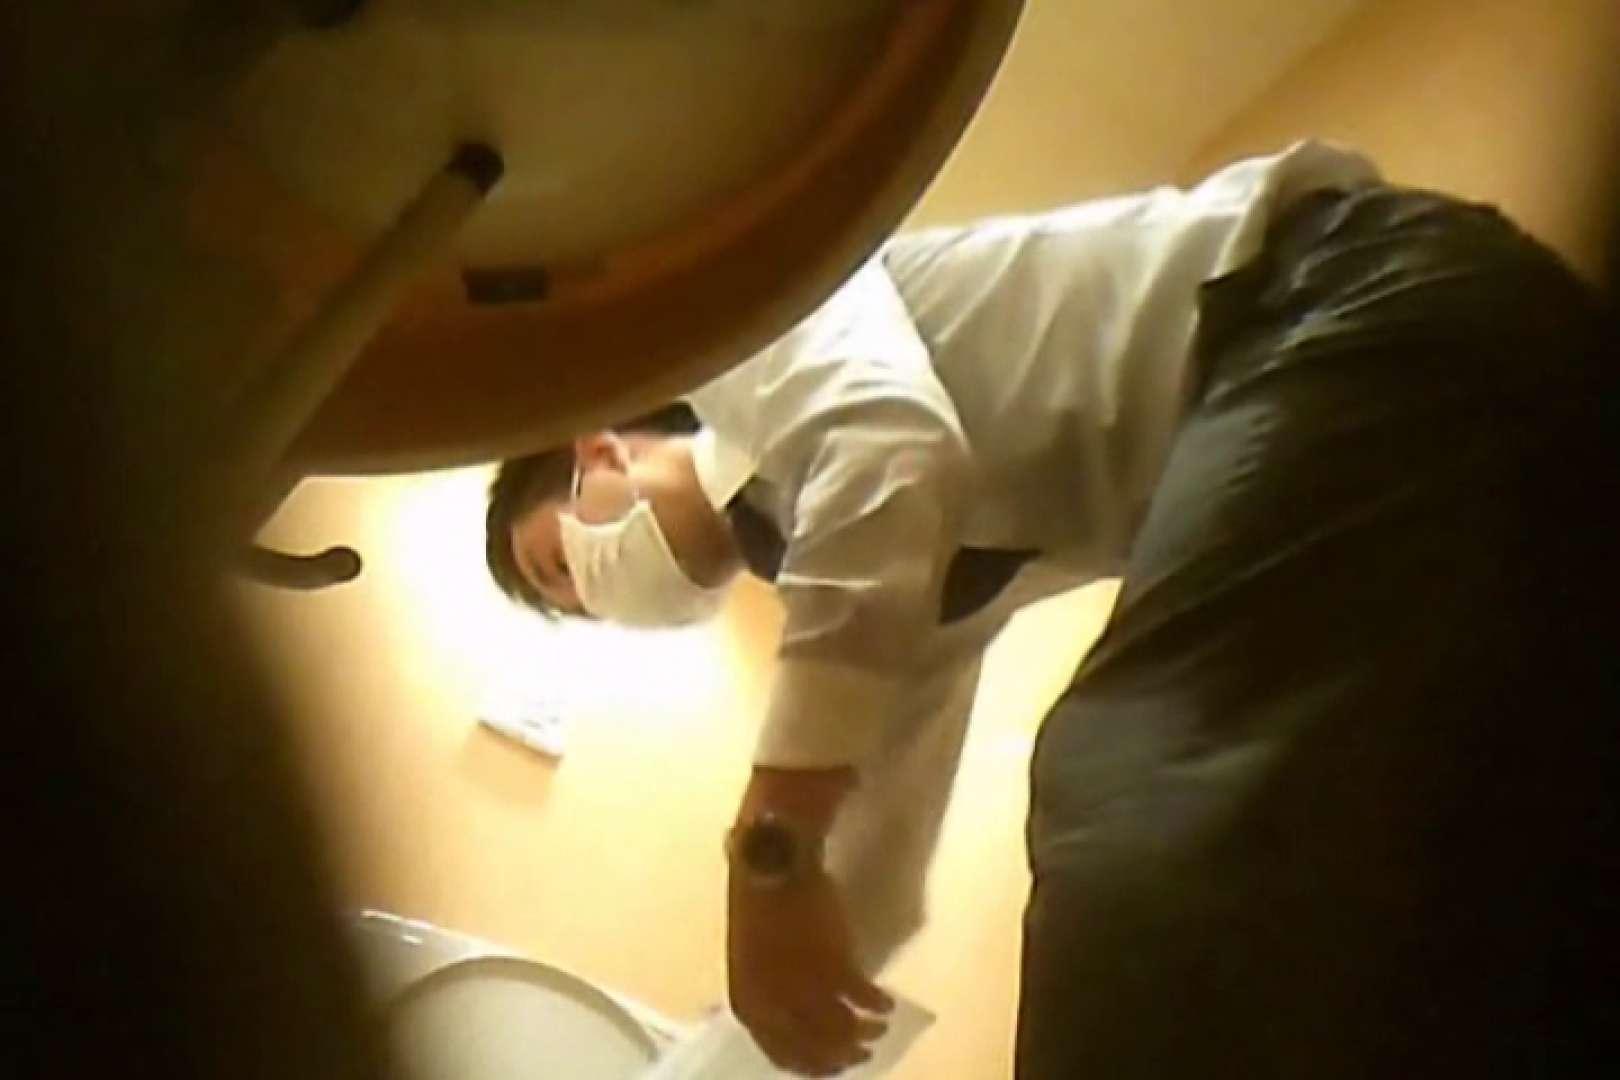 SEASON 3rd!掴み取りさんの洗面所覗き!in新幹線!VOL.02 スーツボーイズ | のぞき  102pic 3